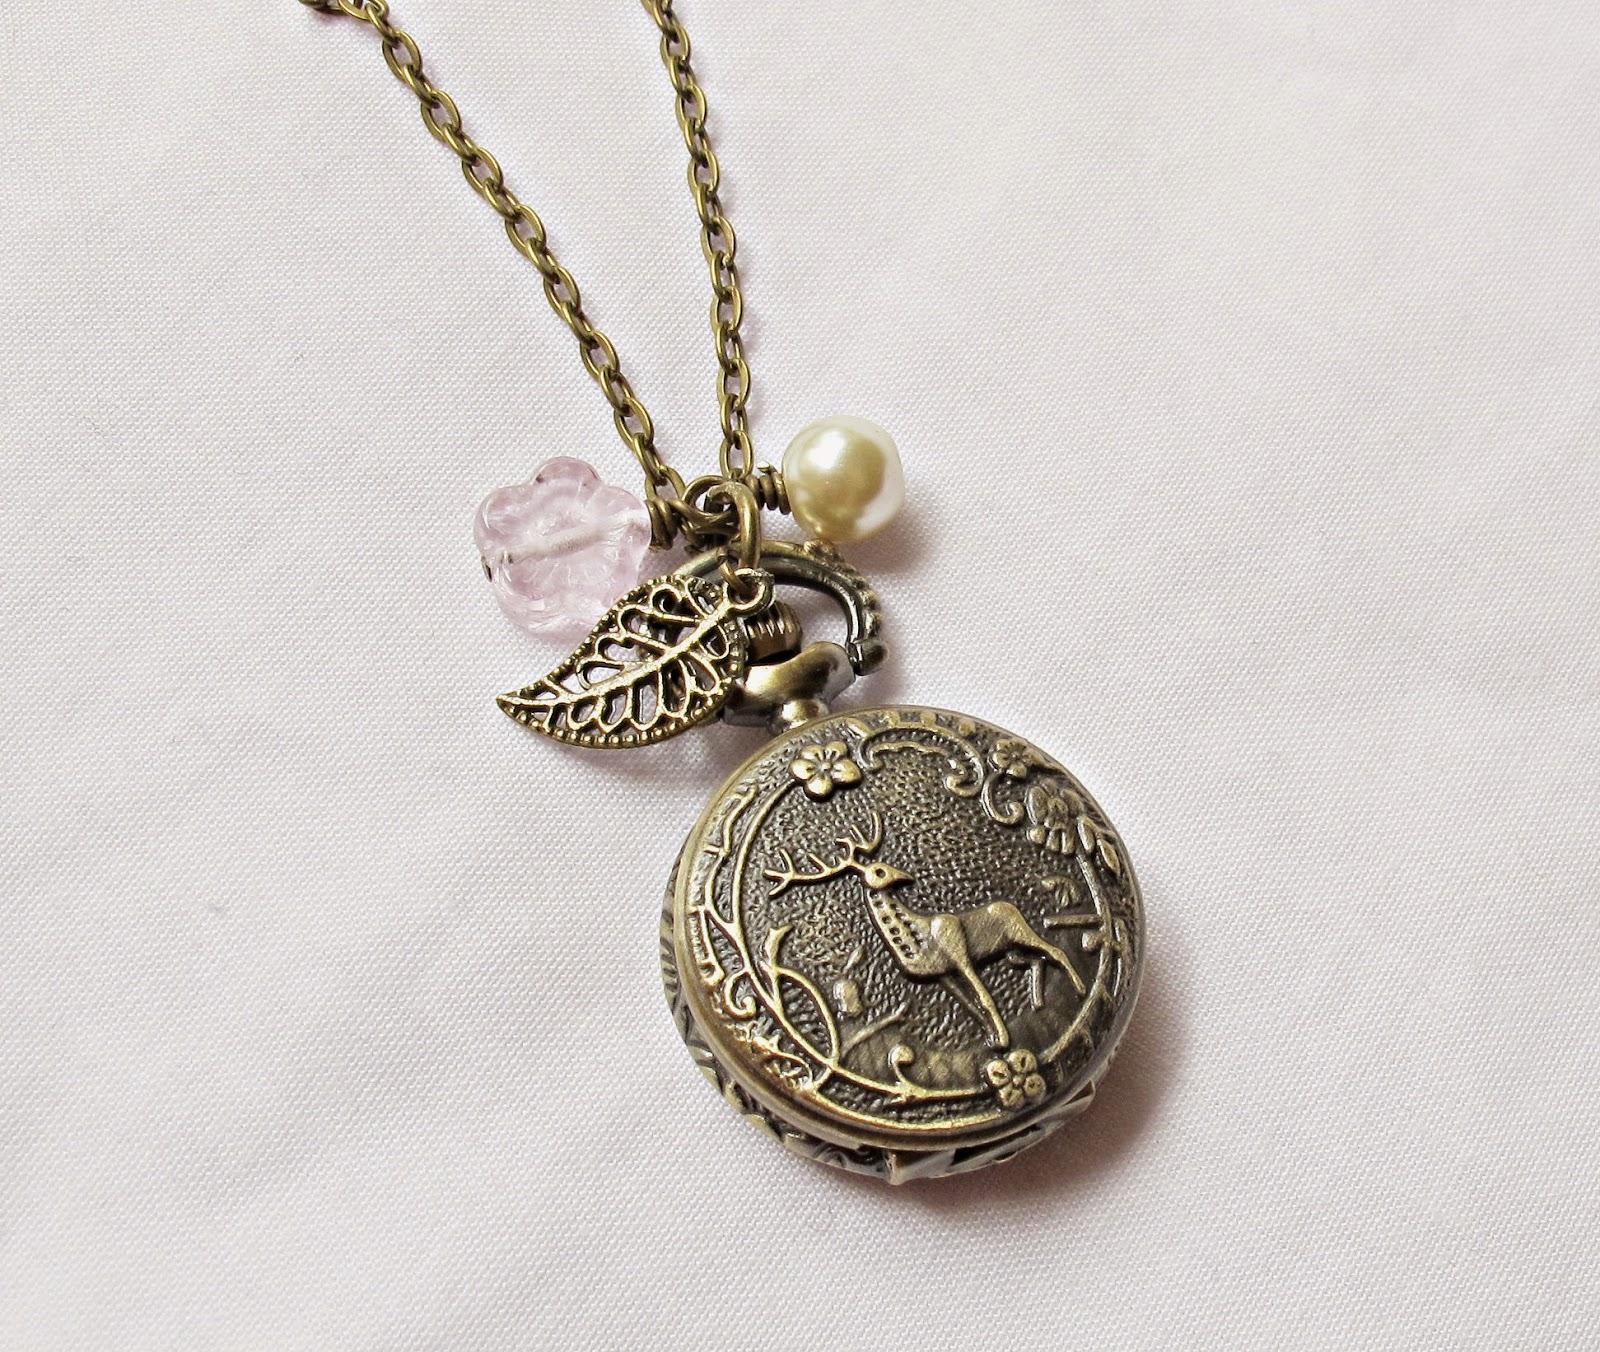 image to kill a mockingbird necklace watch atticus finch brass bronze leaf flower deer woodland two cheeky monkeys